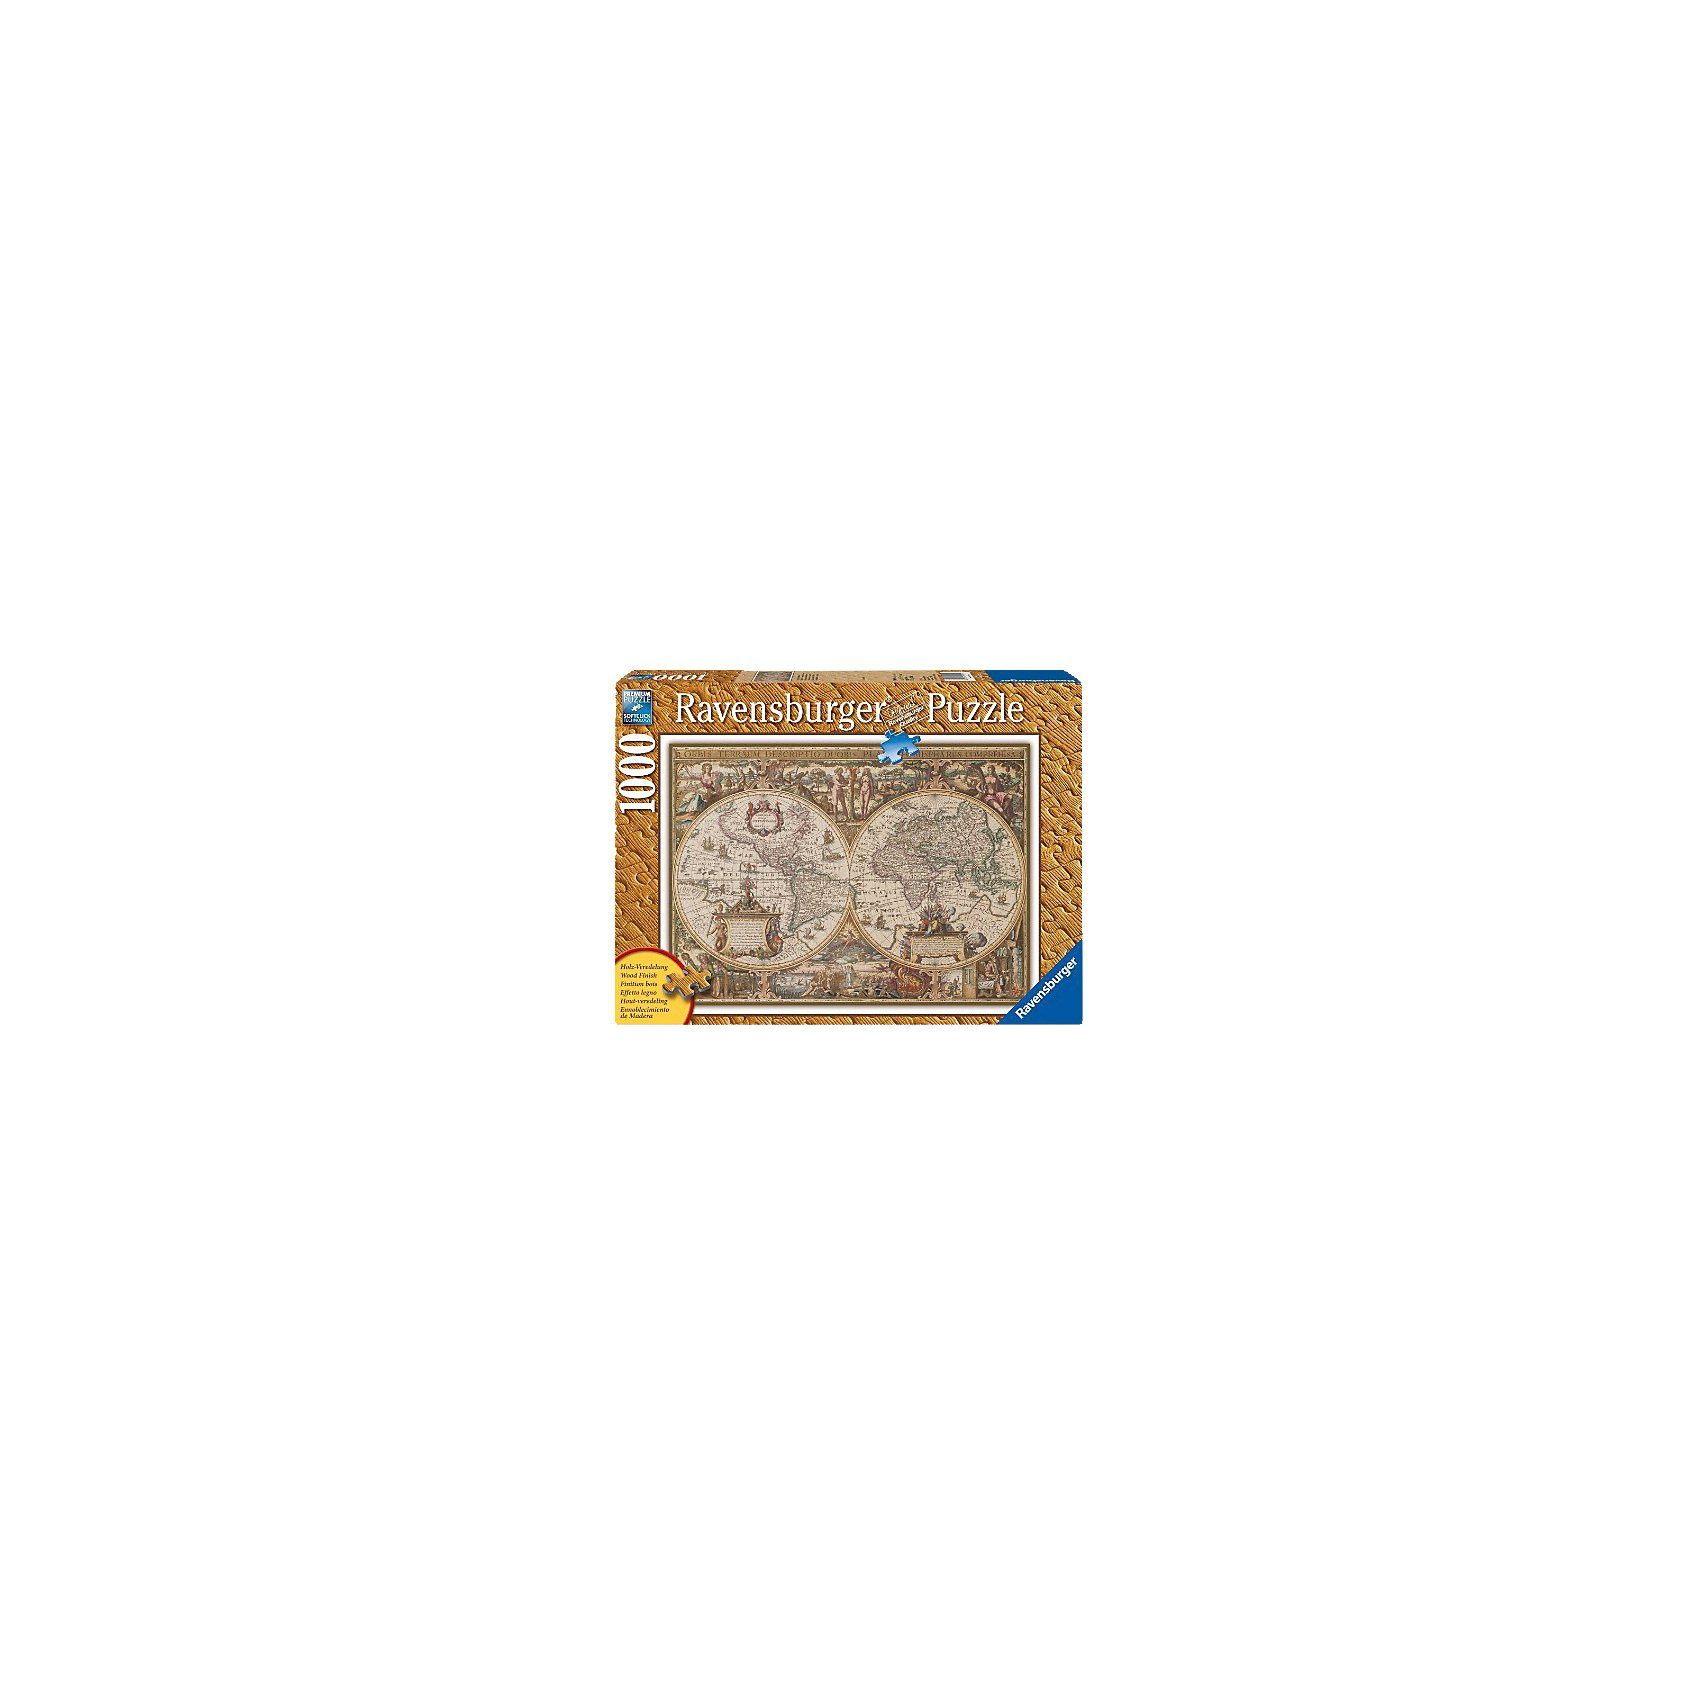 Ravensburger Antike Weltkarte - 1000 Teile Holzstruktur Puzzle